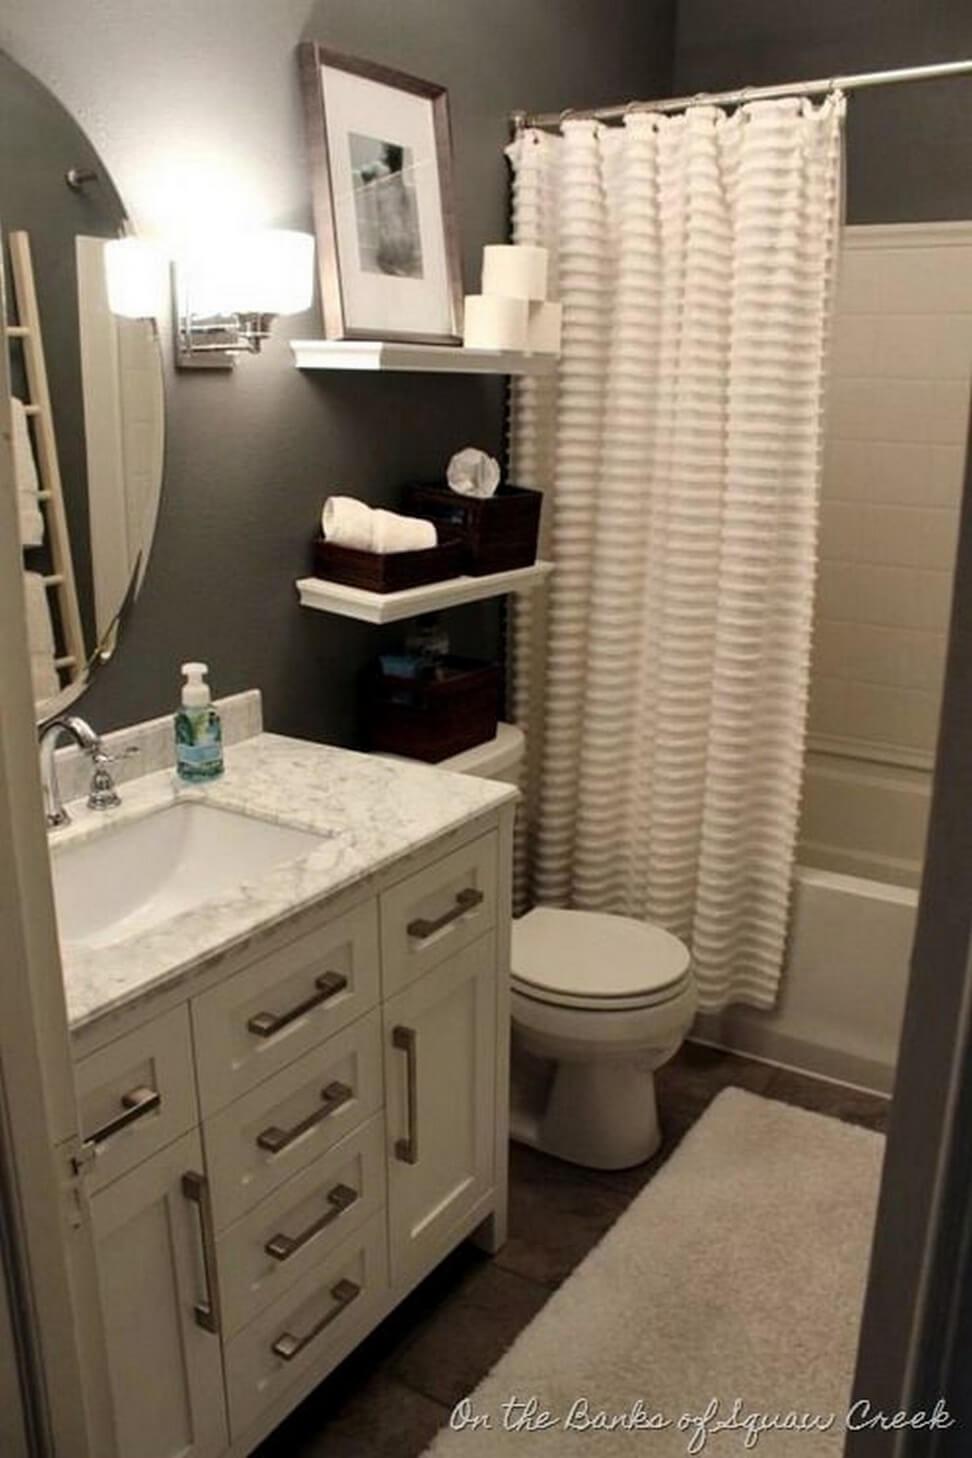 32 Best Small Bathroom Design Ideas and Decorations for 2020 on Bathroom Ideas Apartment  id=38922